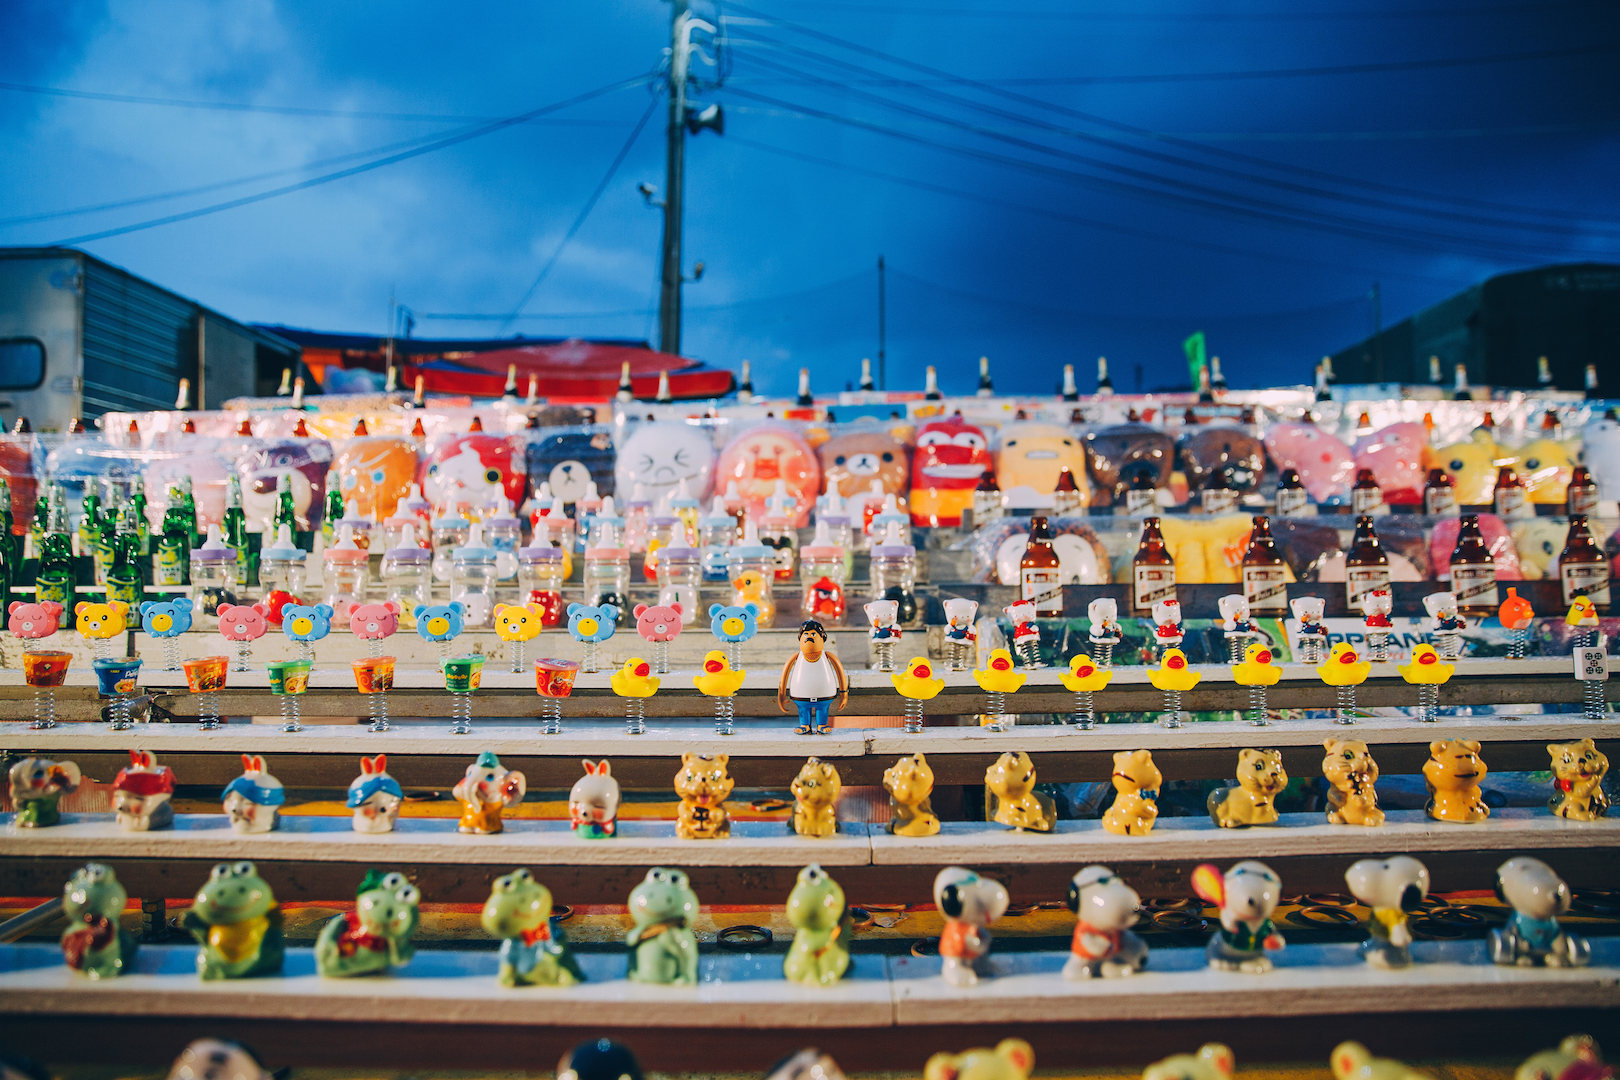 narcos_toy_project_gardennightmarket